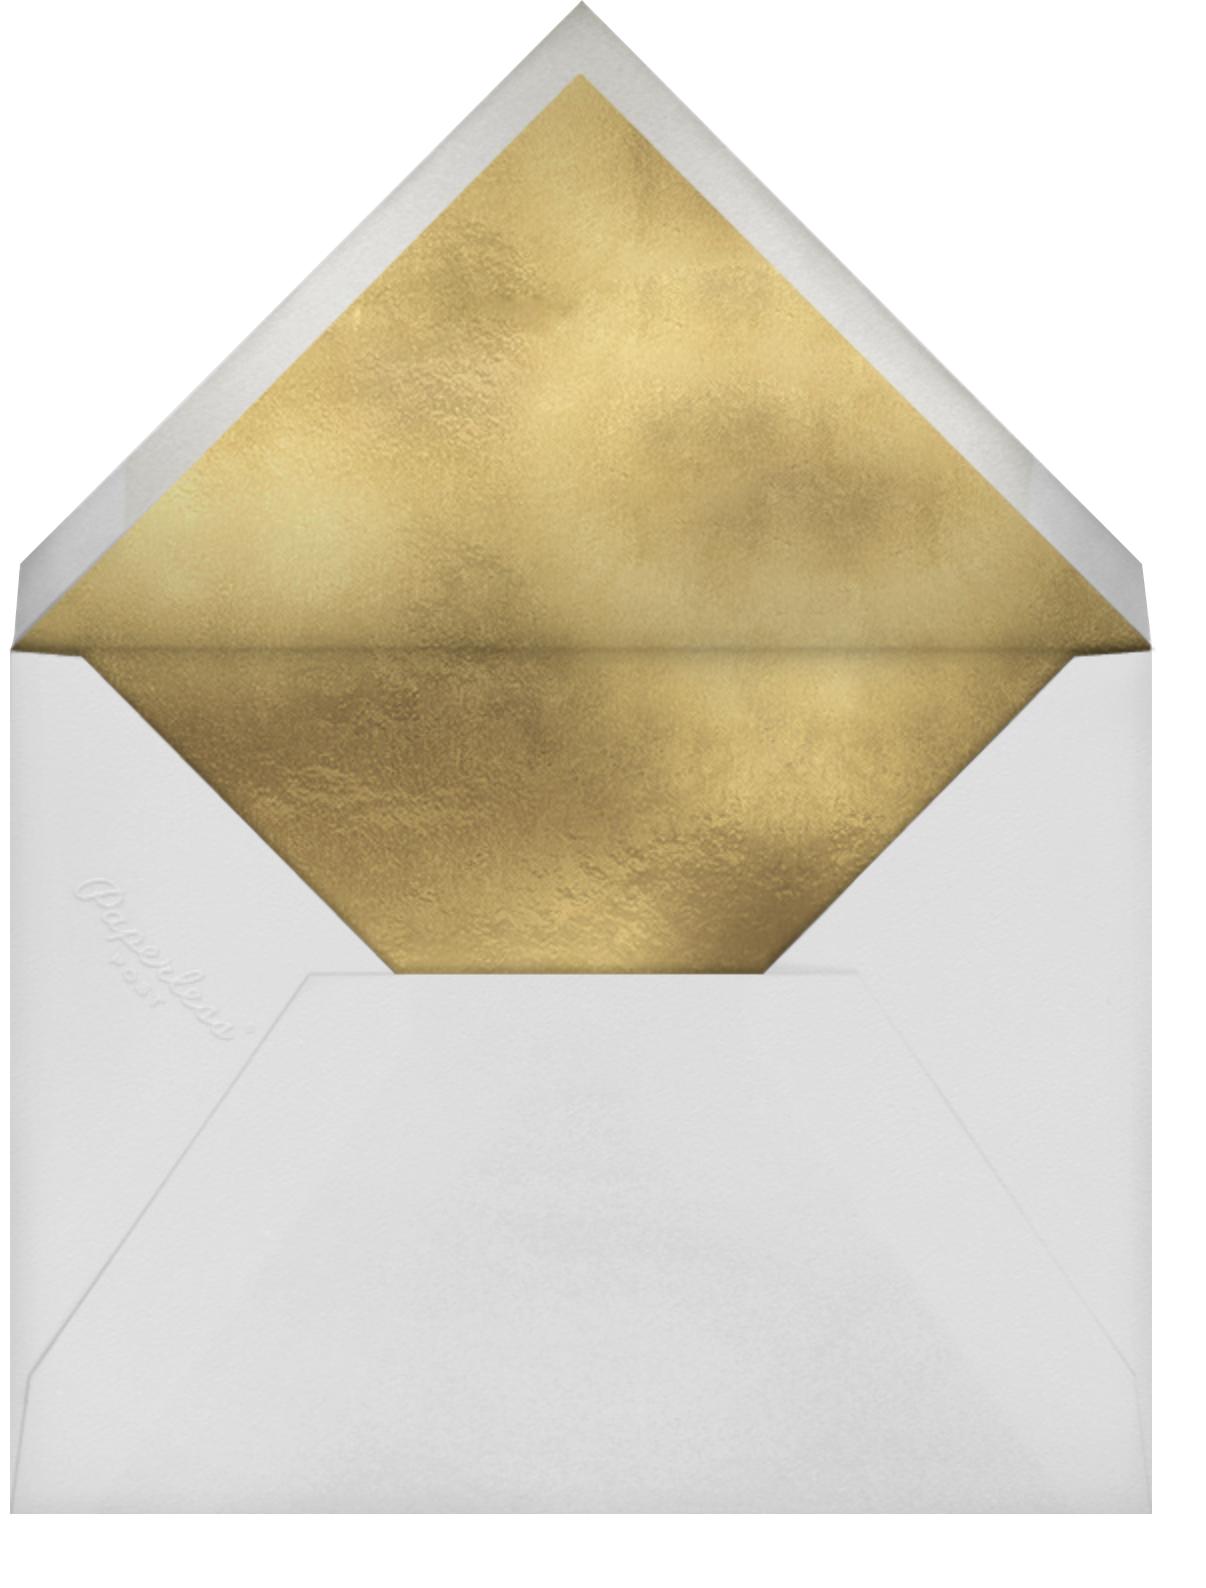 Digital Bubbles - Sugar Paper - Adult birthday - envelope back